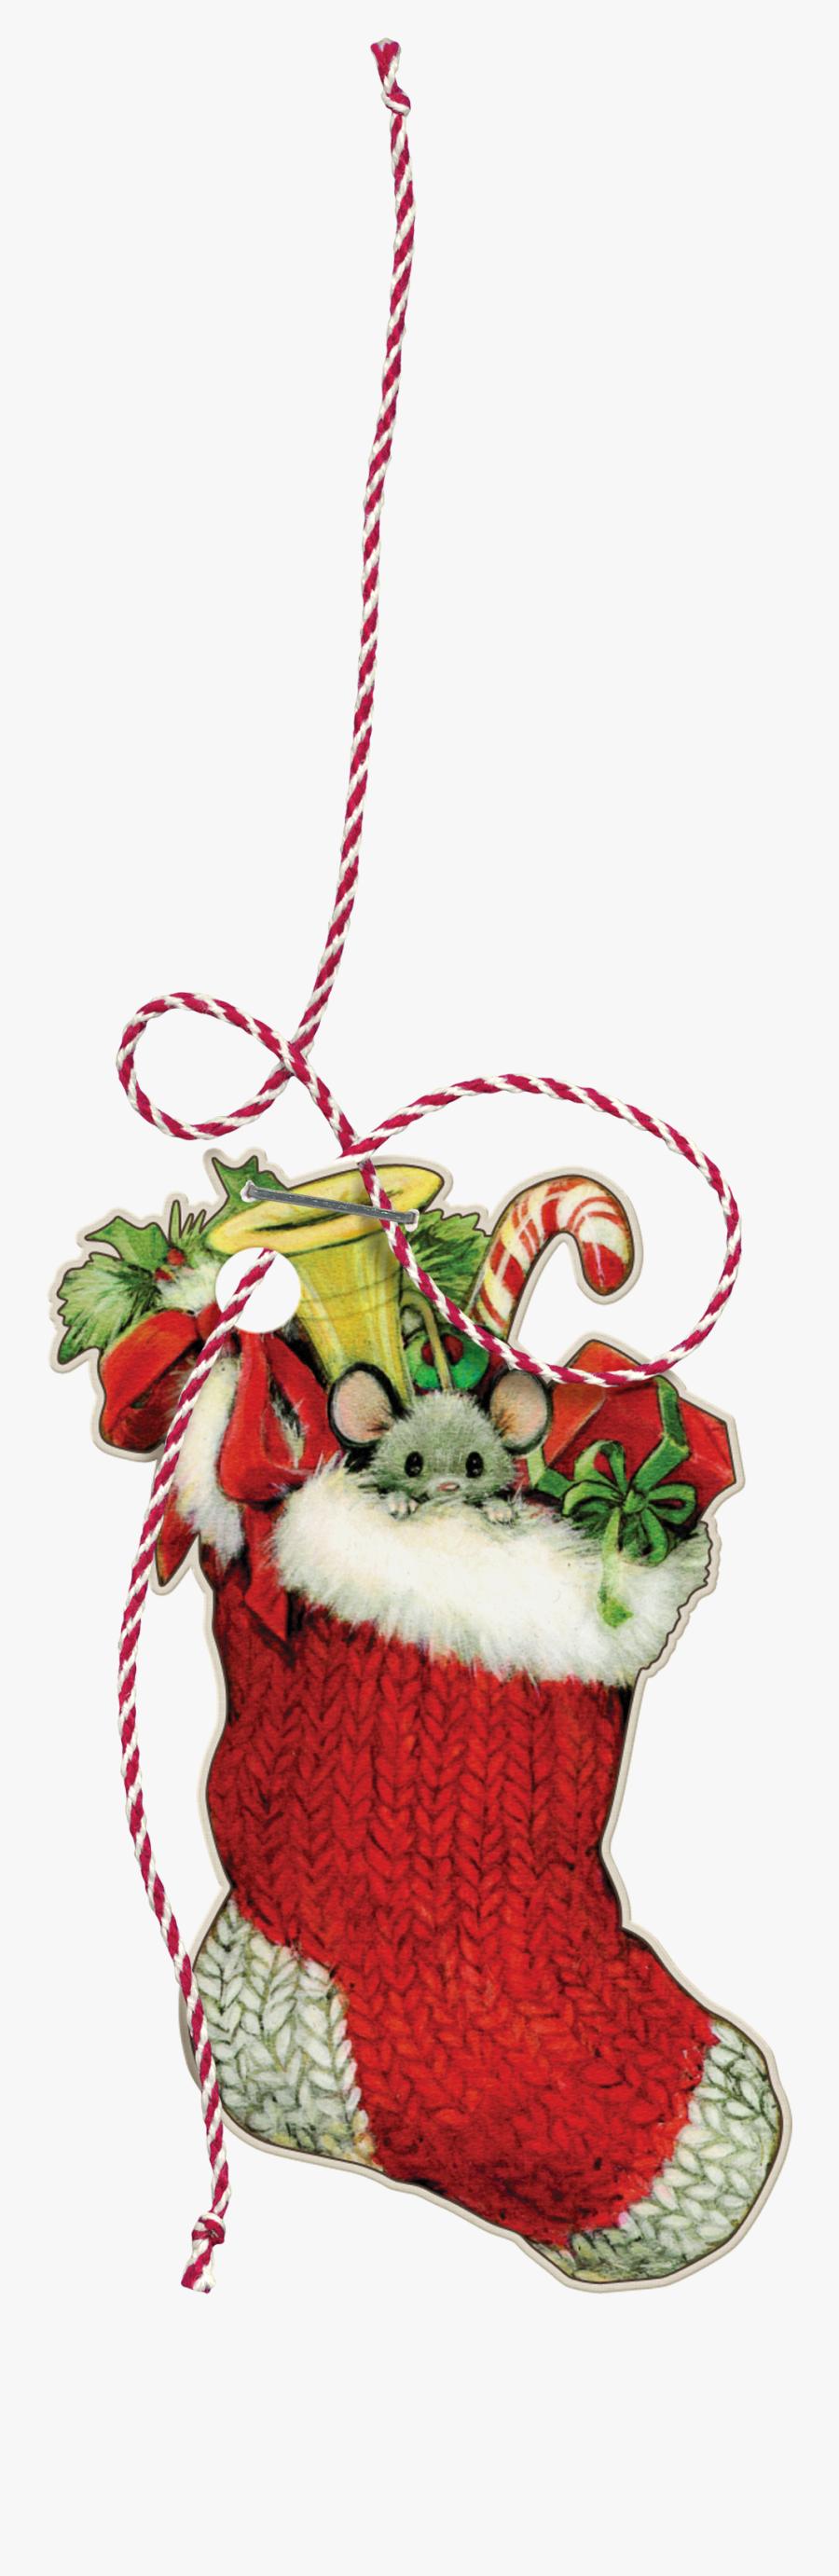 Ornament Christmas Socks Free Hq Image Clipart - Christmas Ornament, Transparent Clipart